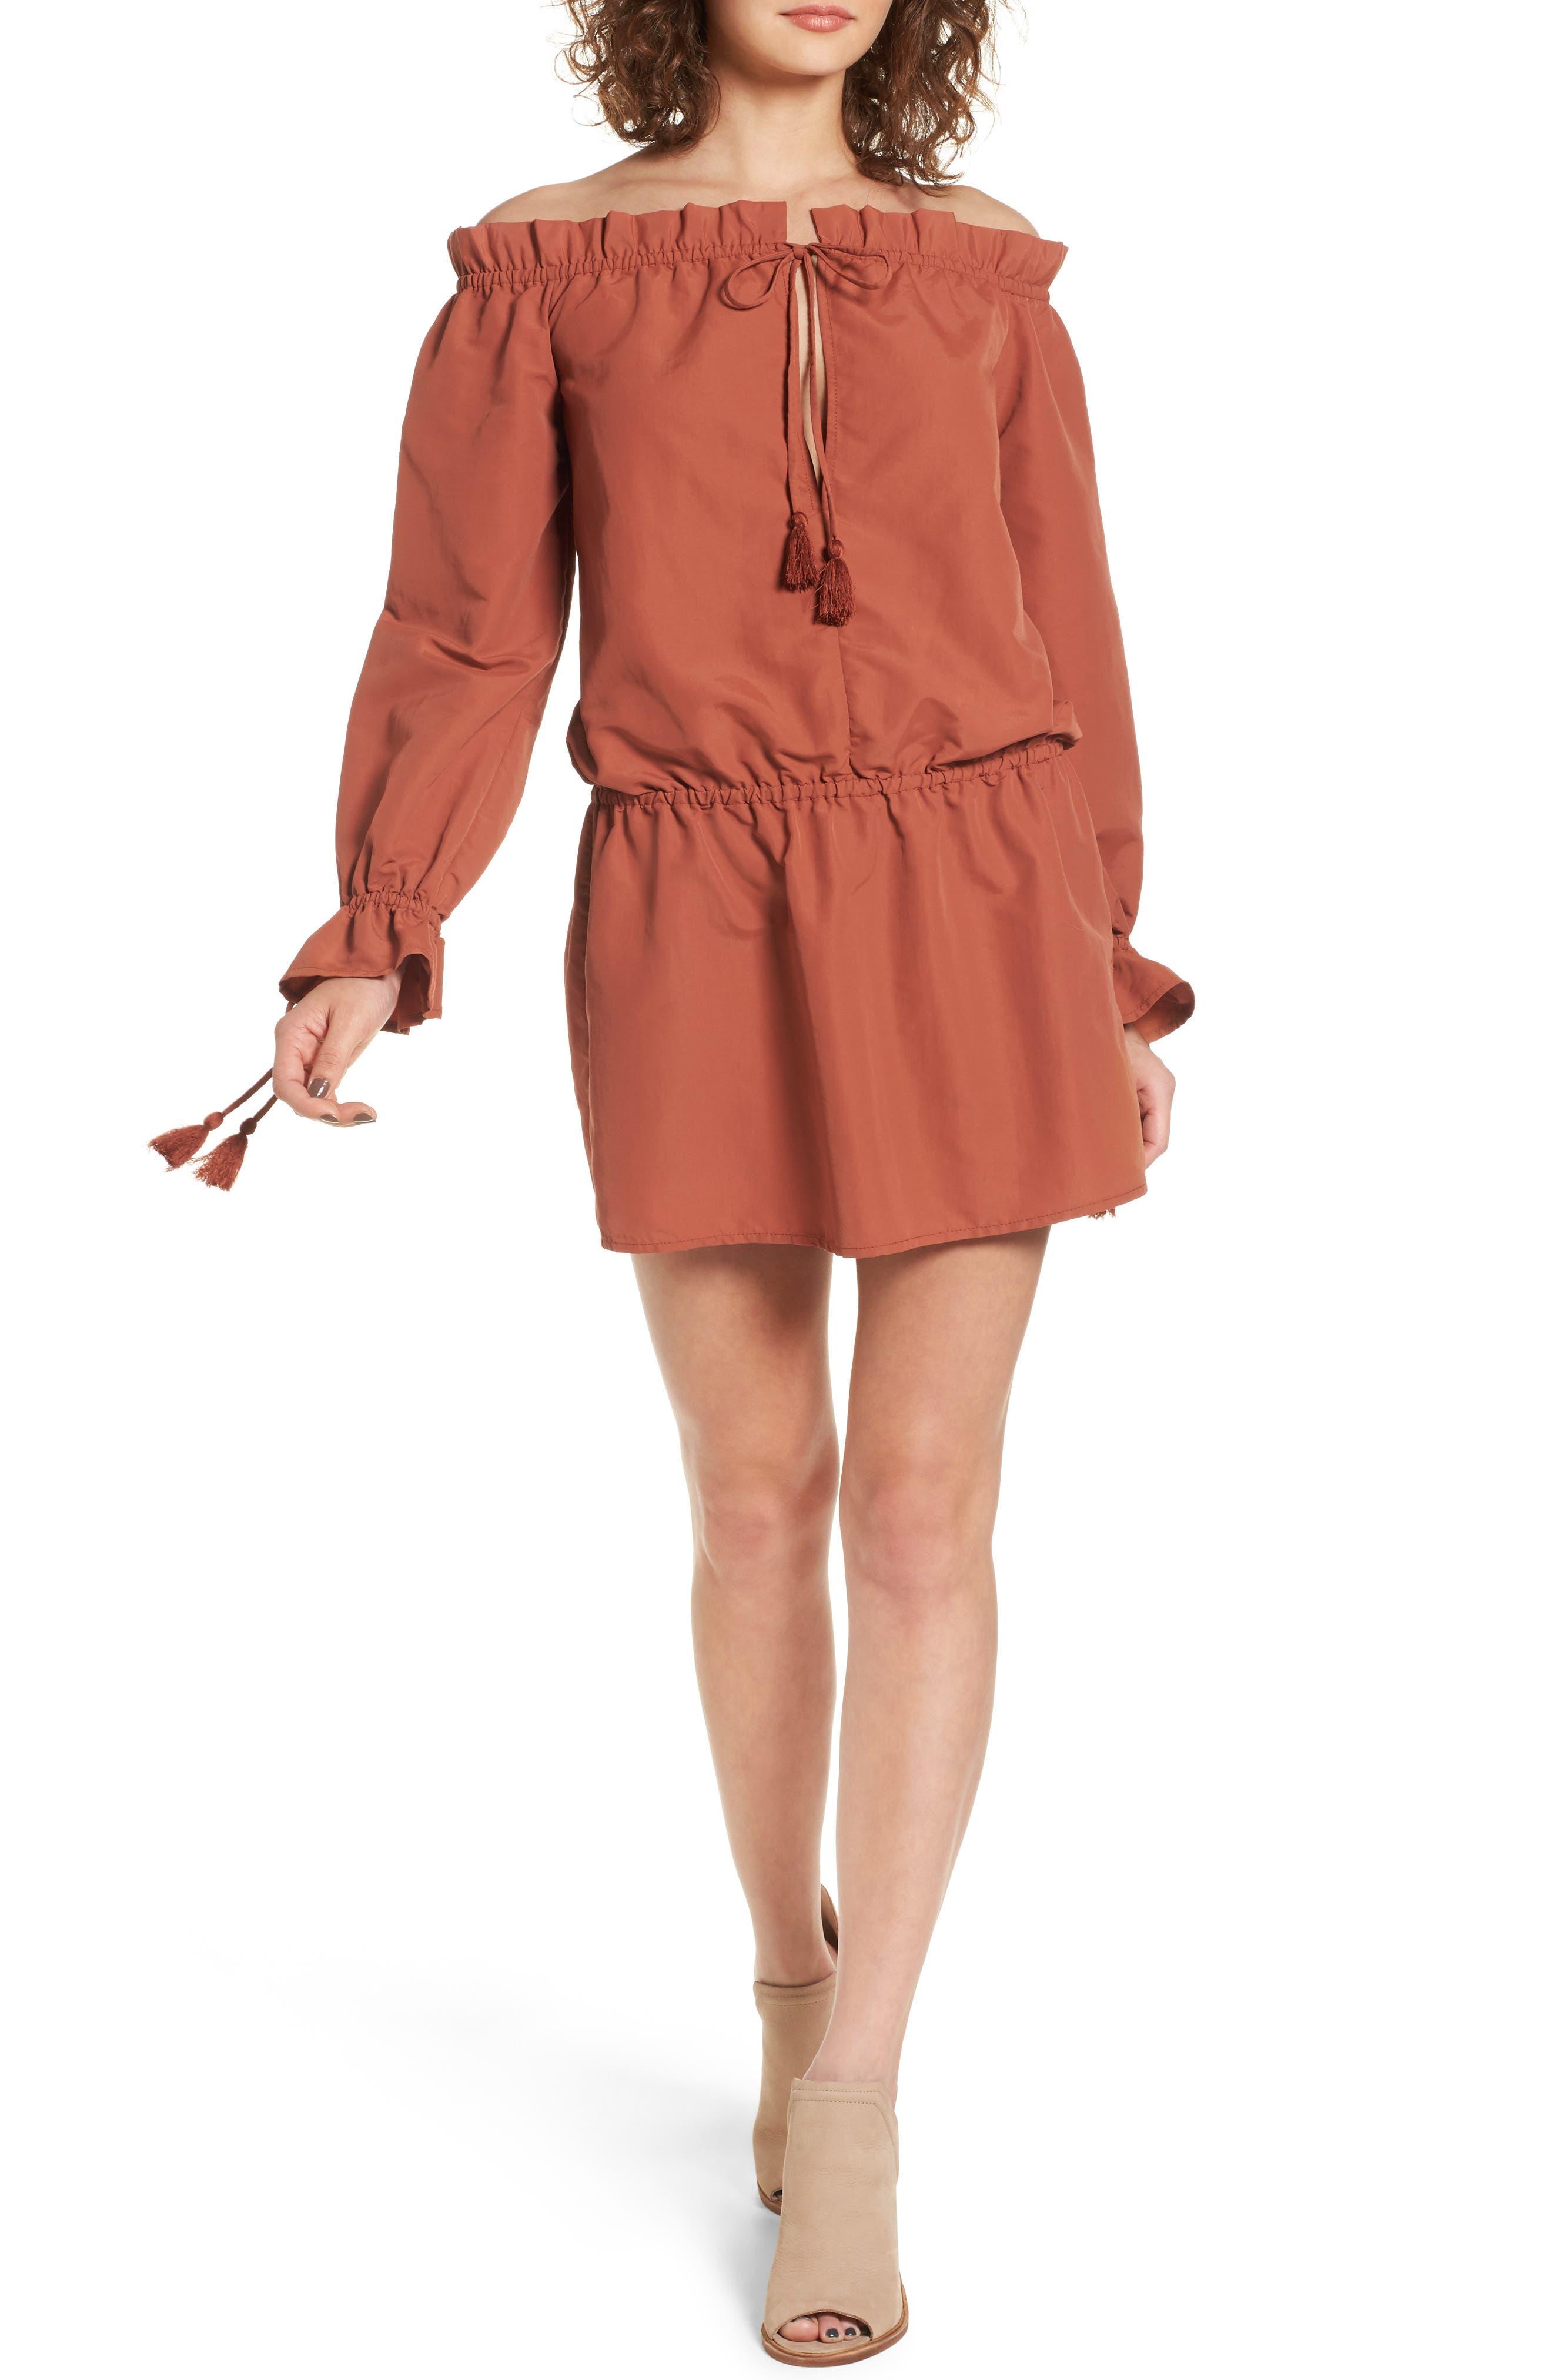 Tularosa Falon Off the Shoulder Dress